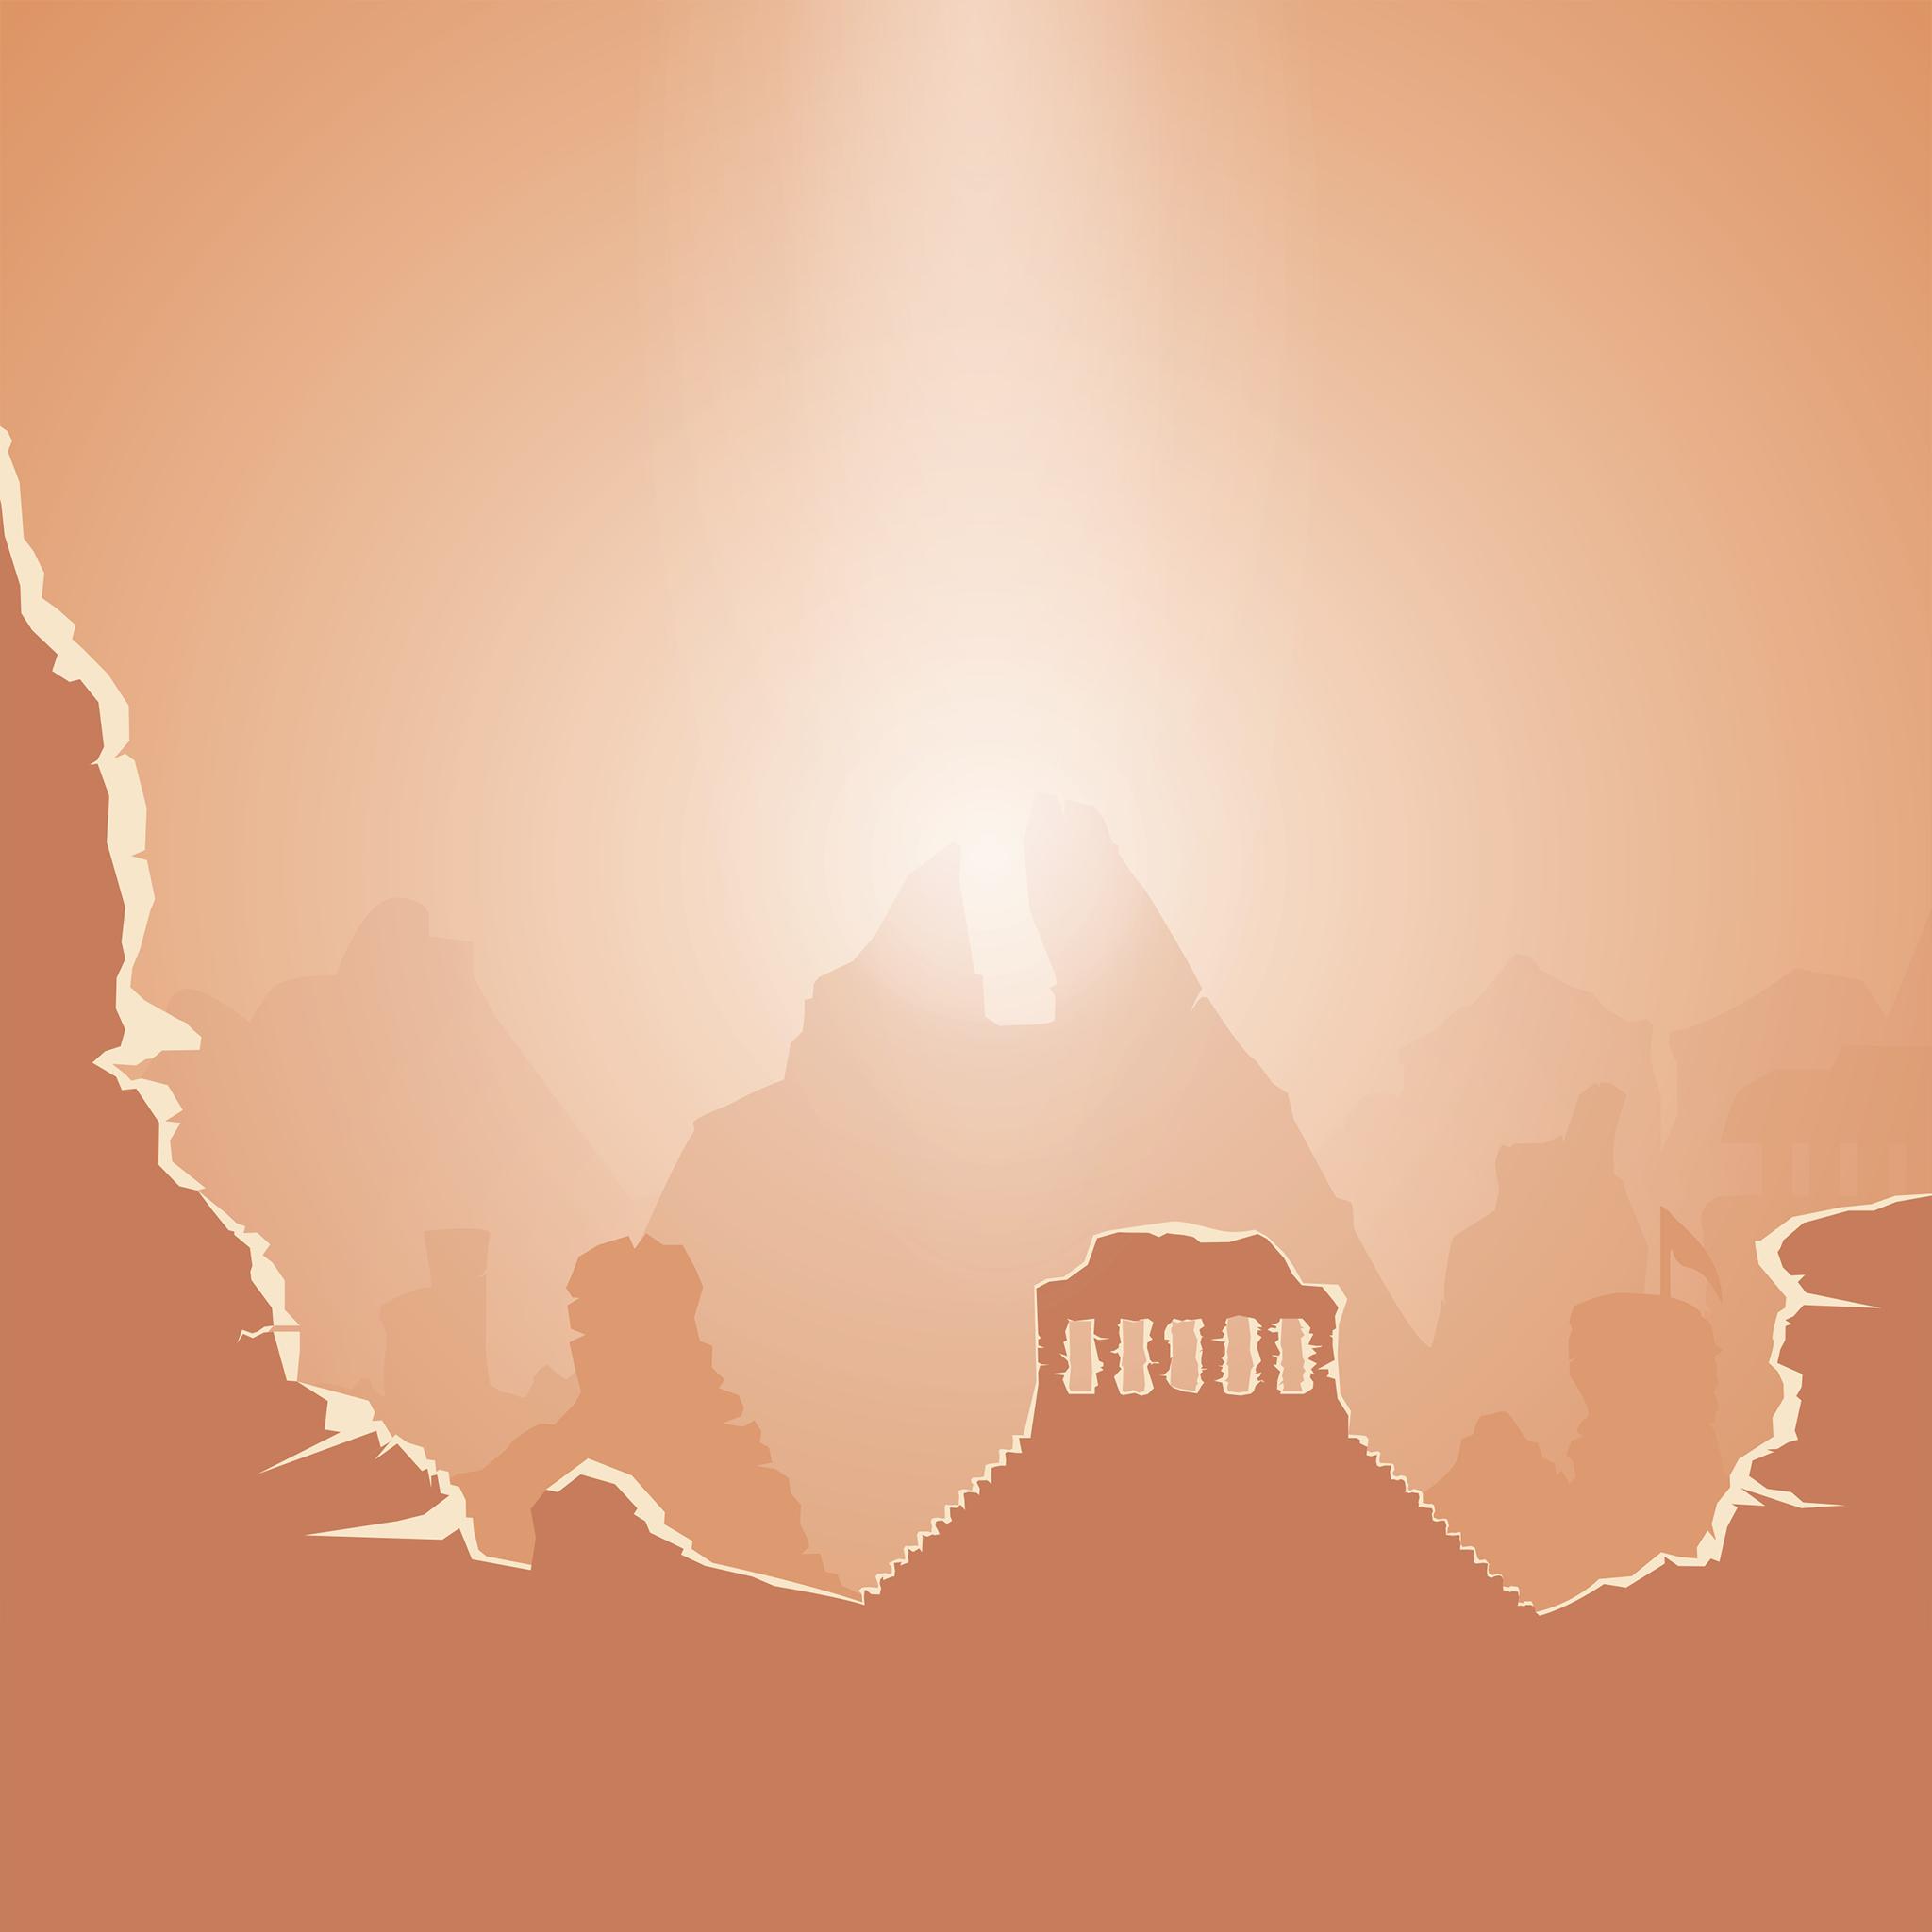 Temple Cartoon iPad Wallpaper